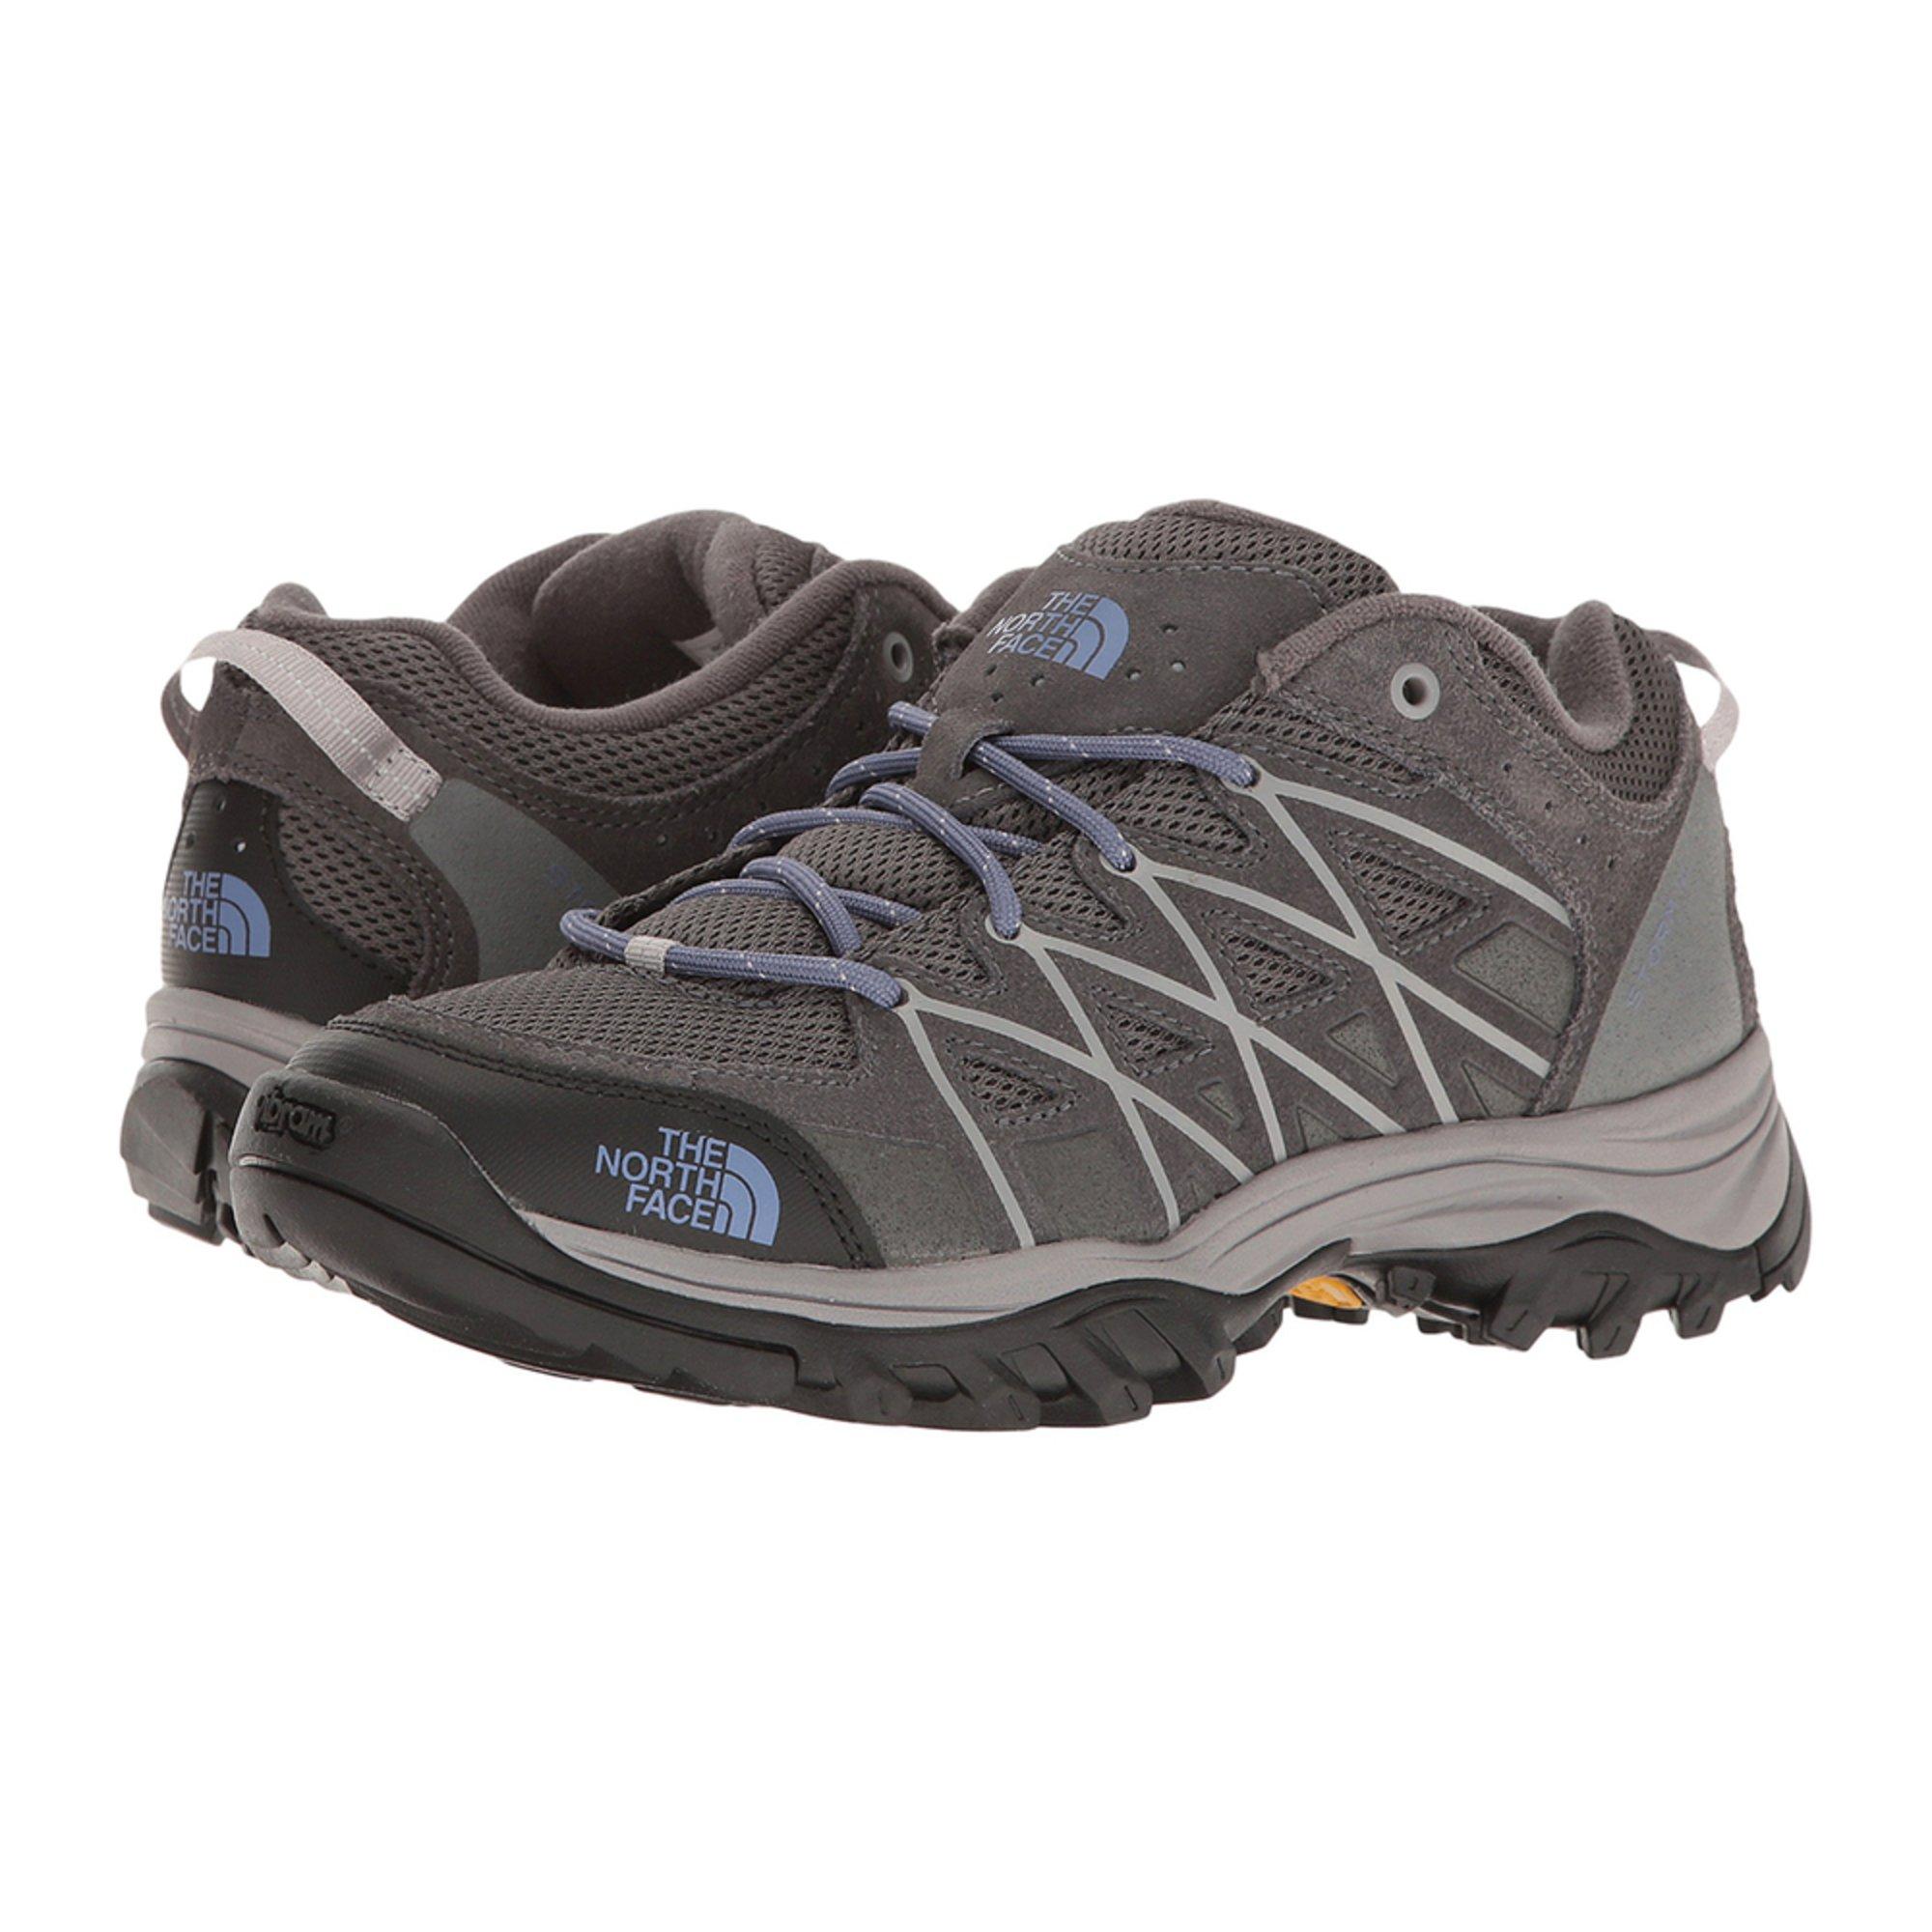 23b6e768b06 The North Face Women's Storm Iii Mid Waterproof Hiking Shoe ...